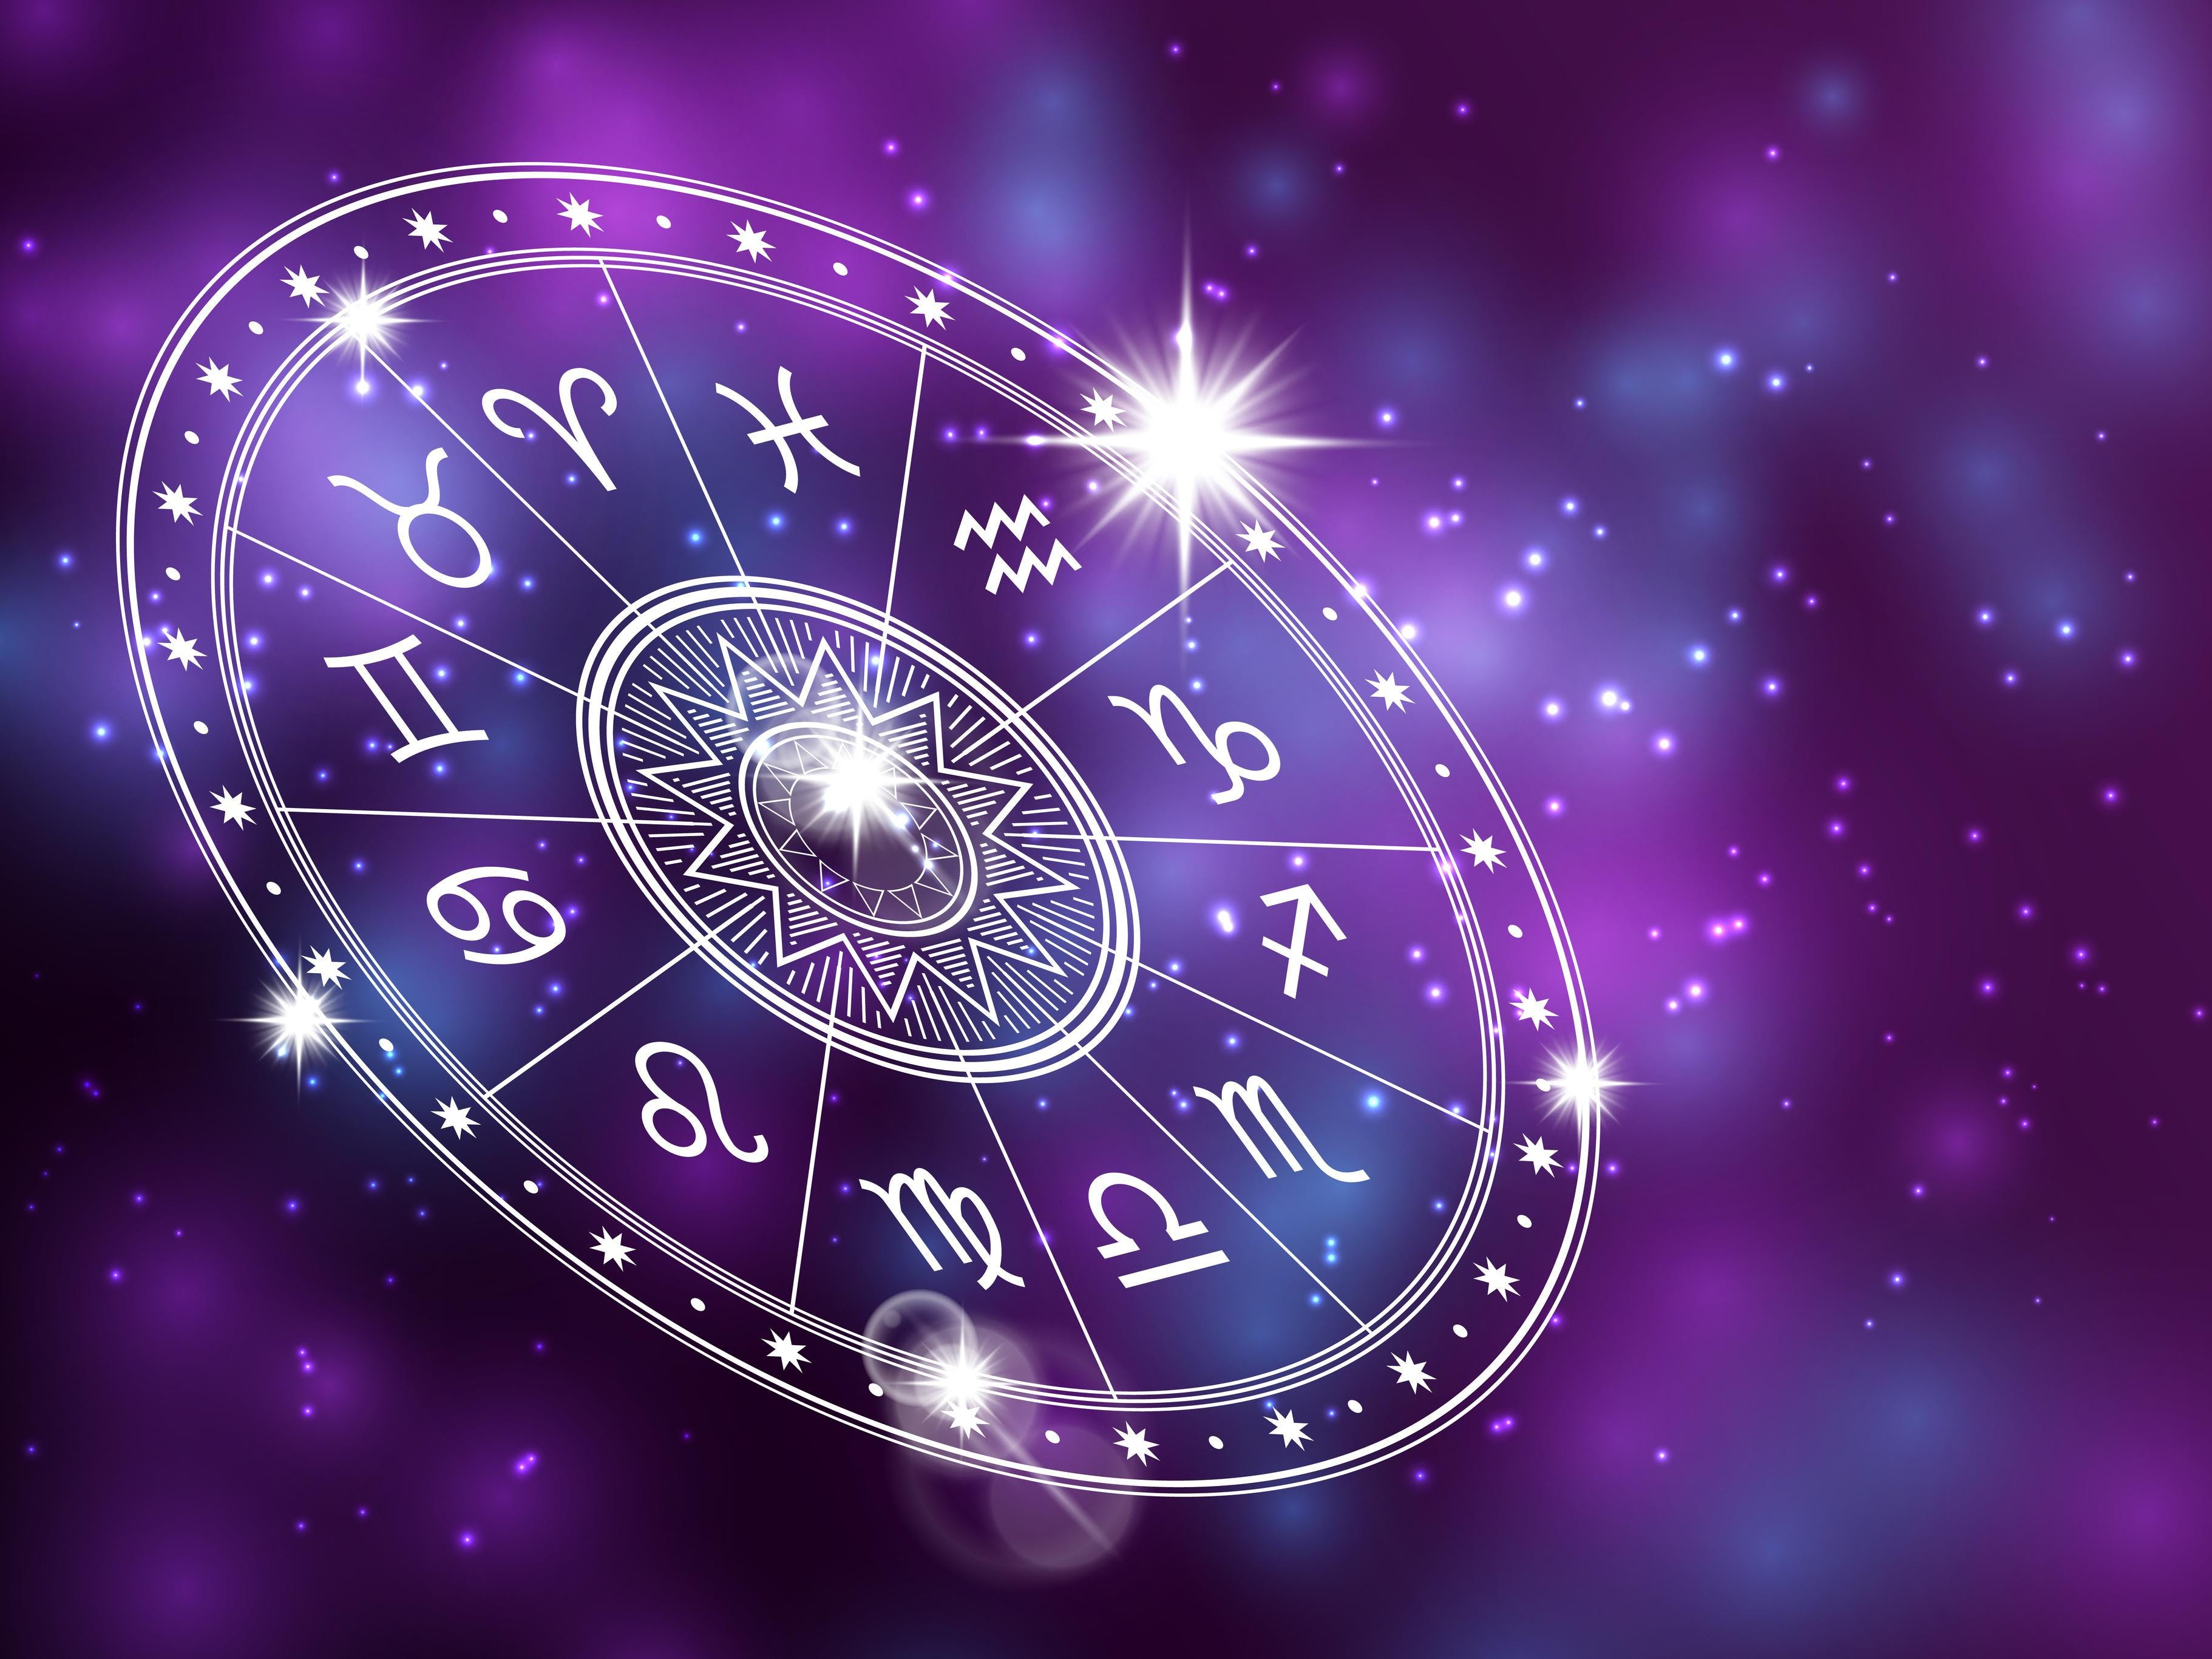 Wine, Women & Astrology Night: Let's Take a Sneak Peek Into Your Next 90 Days!